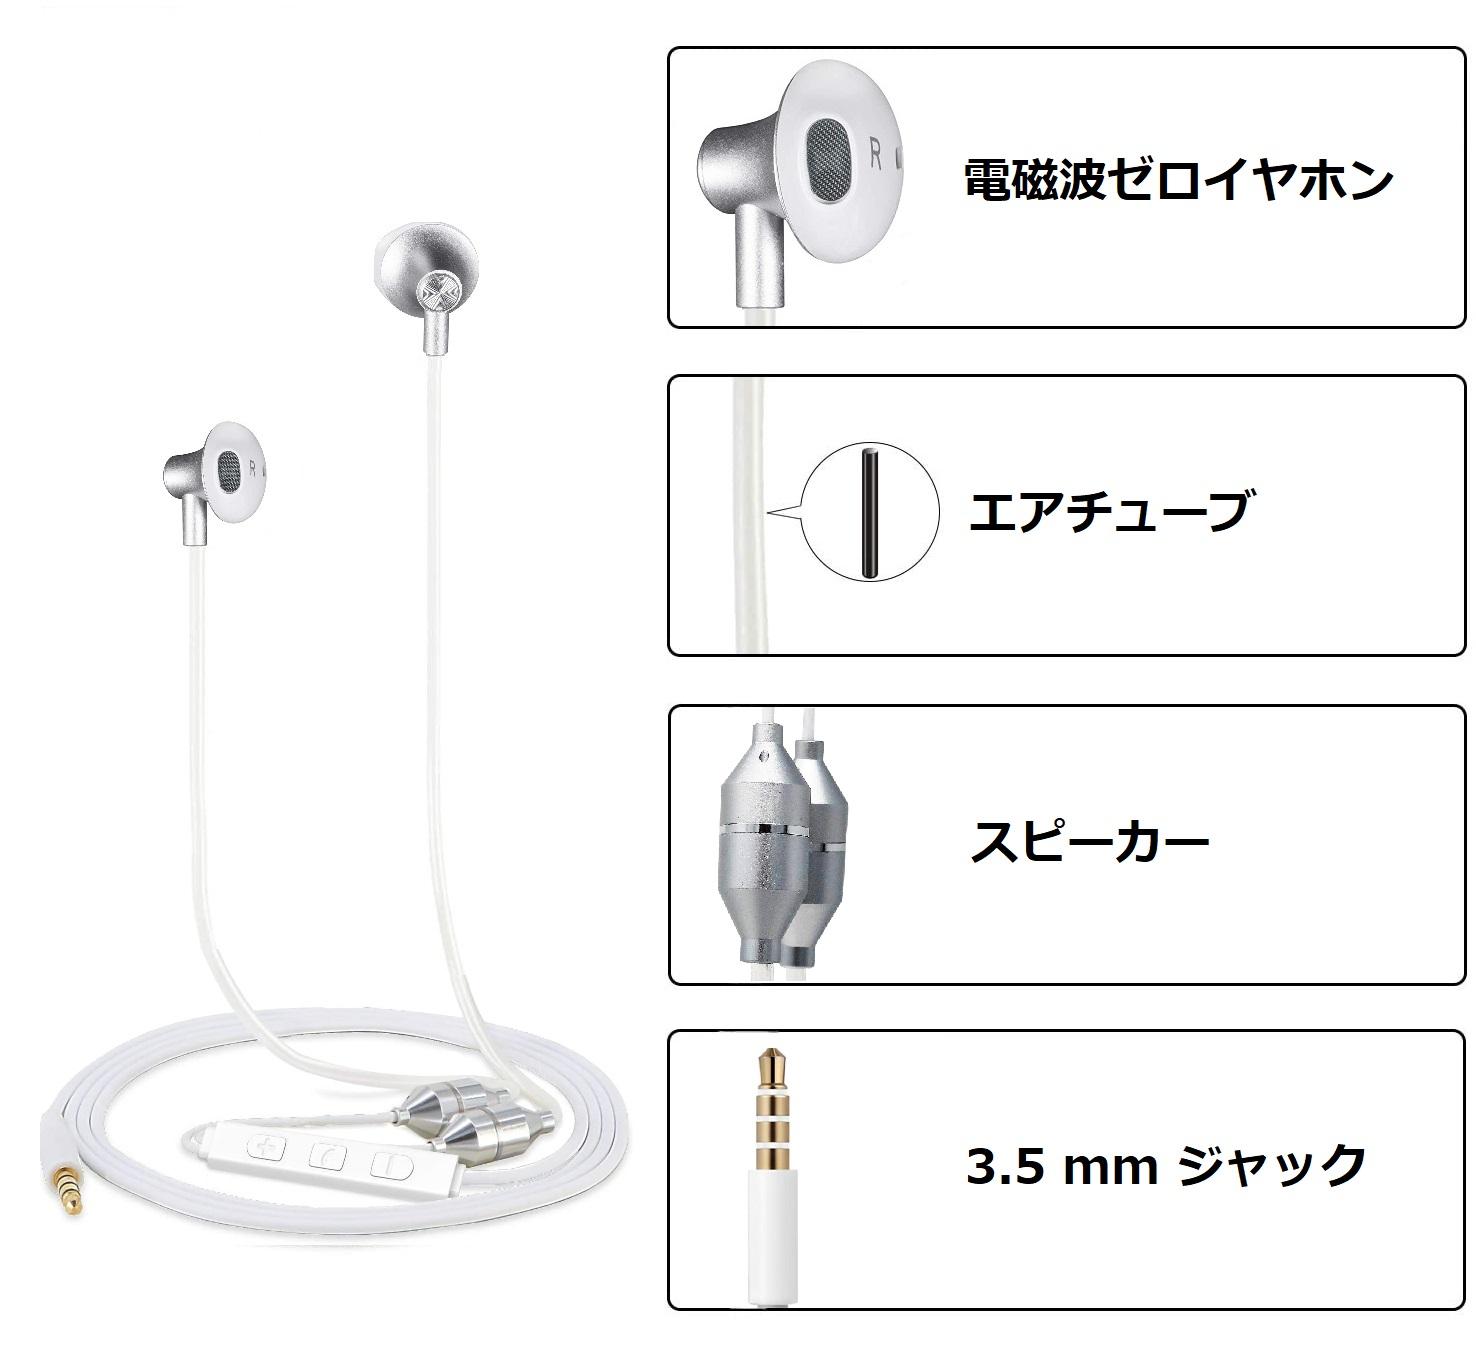 Headphone Info Pic 2